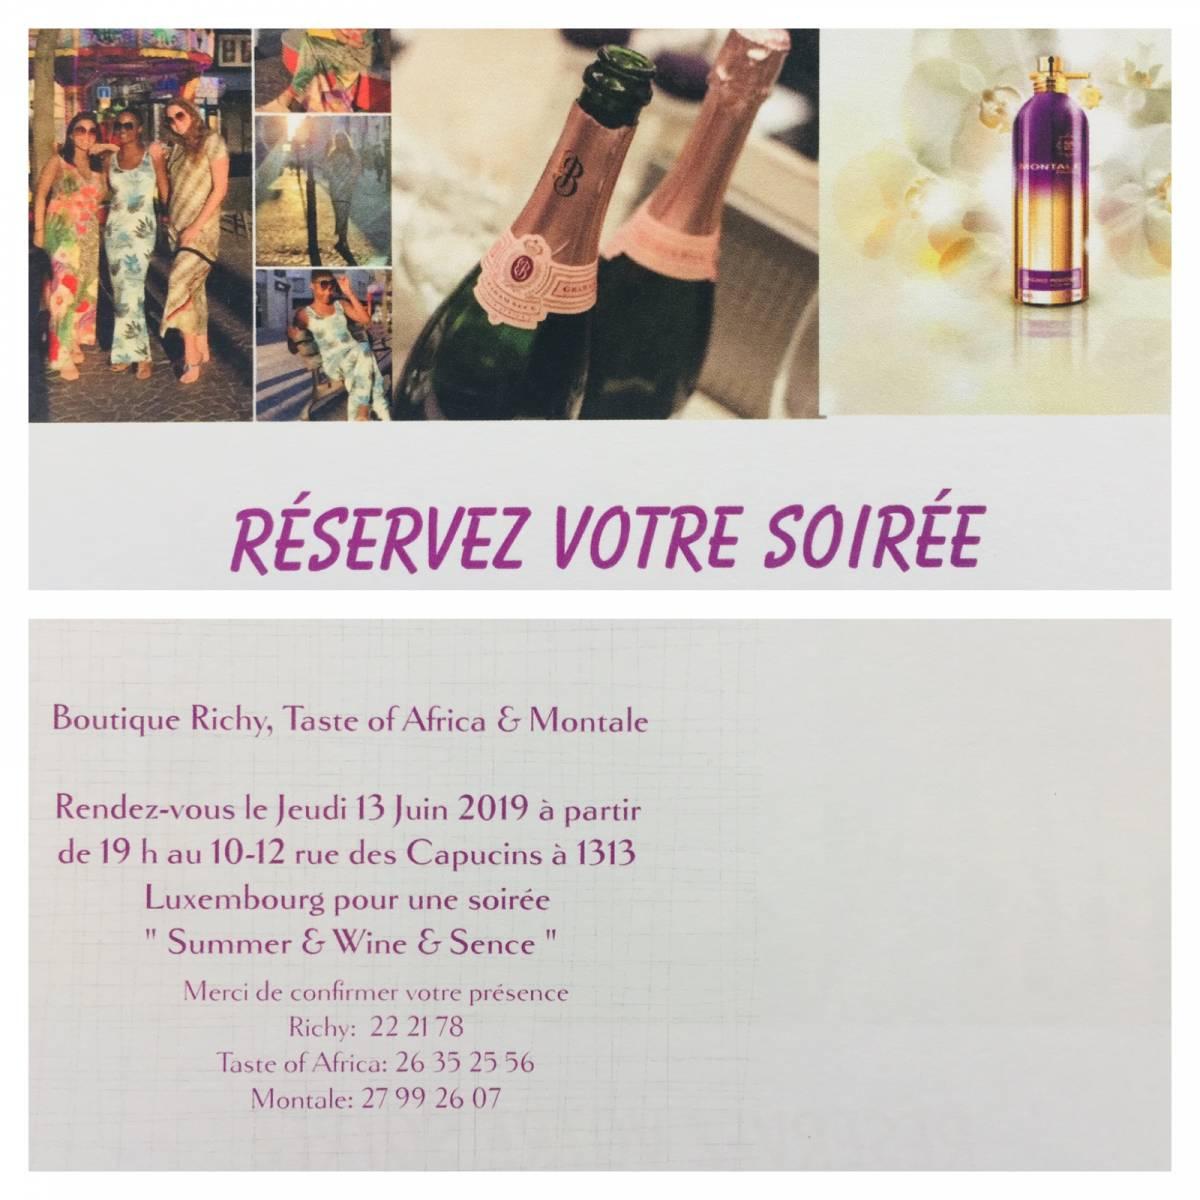 Summer & Wine & Scent